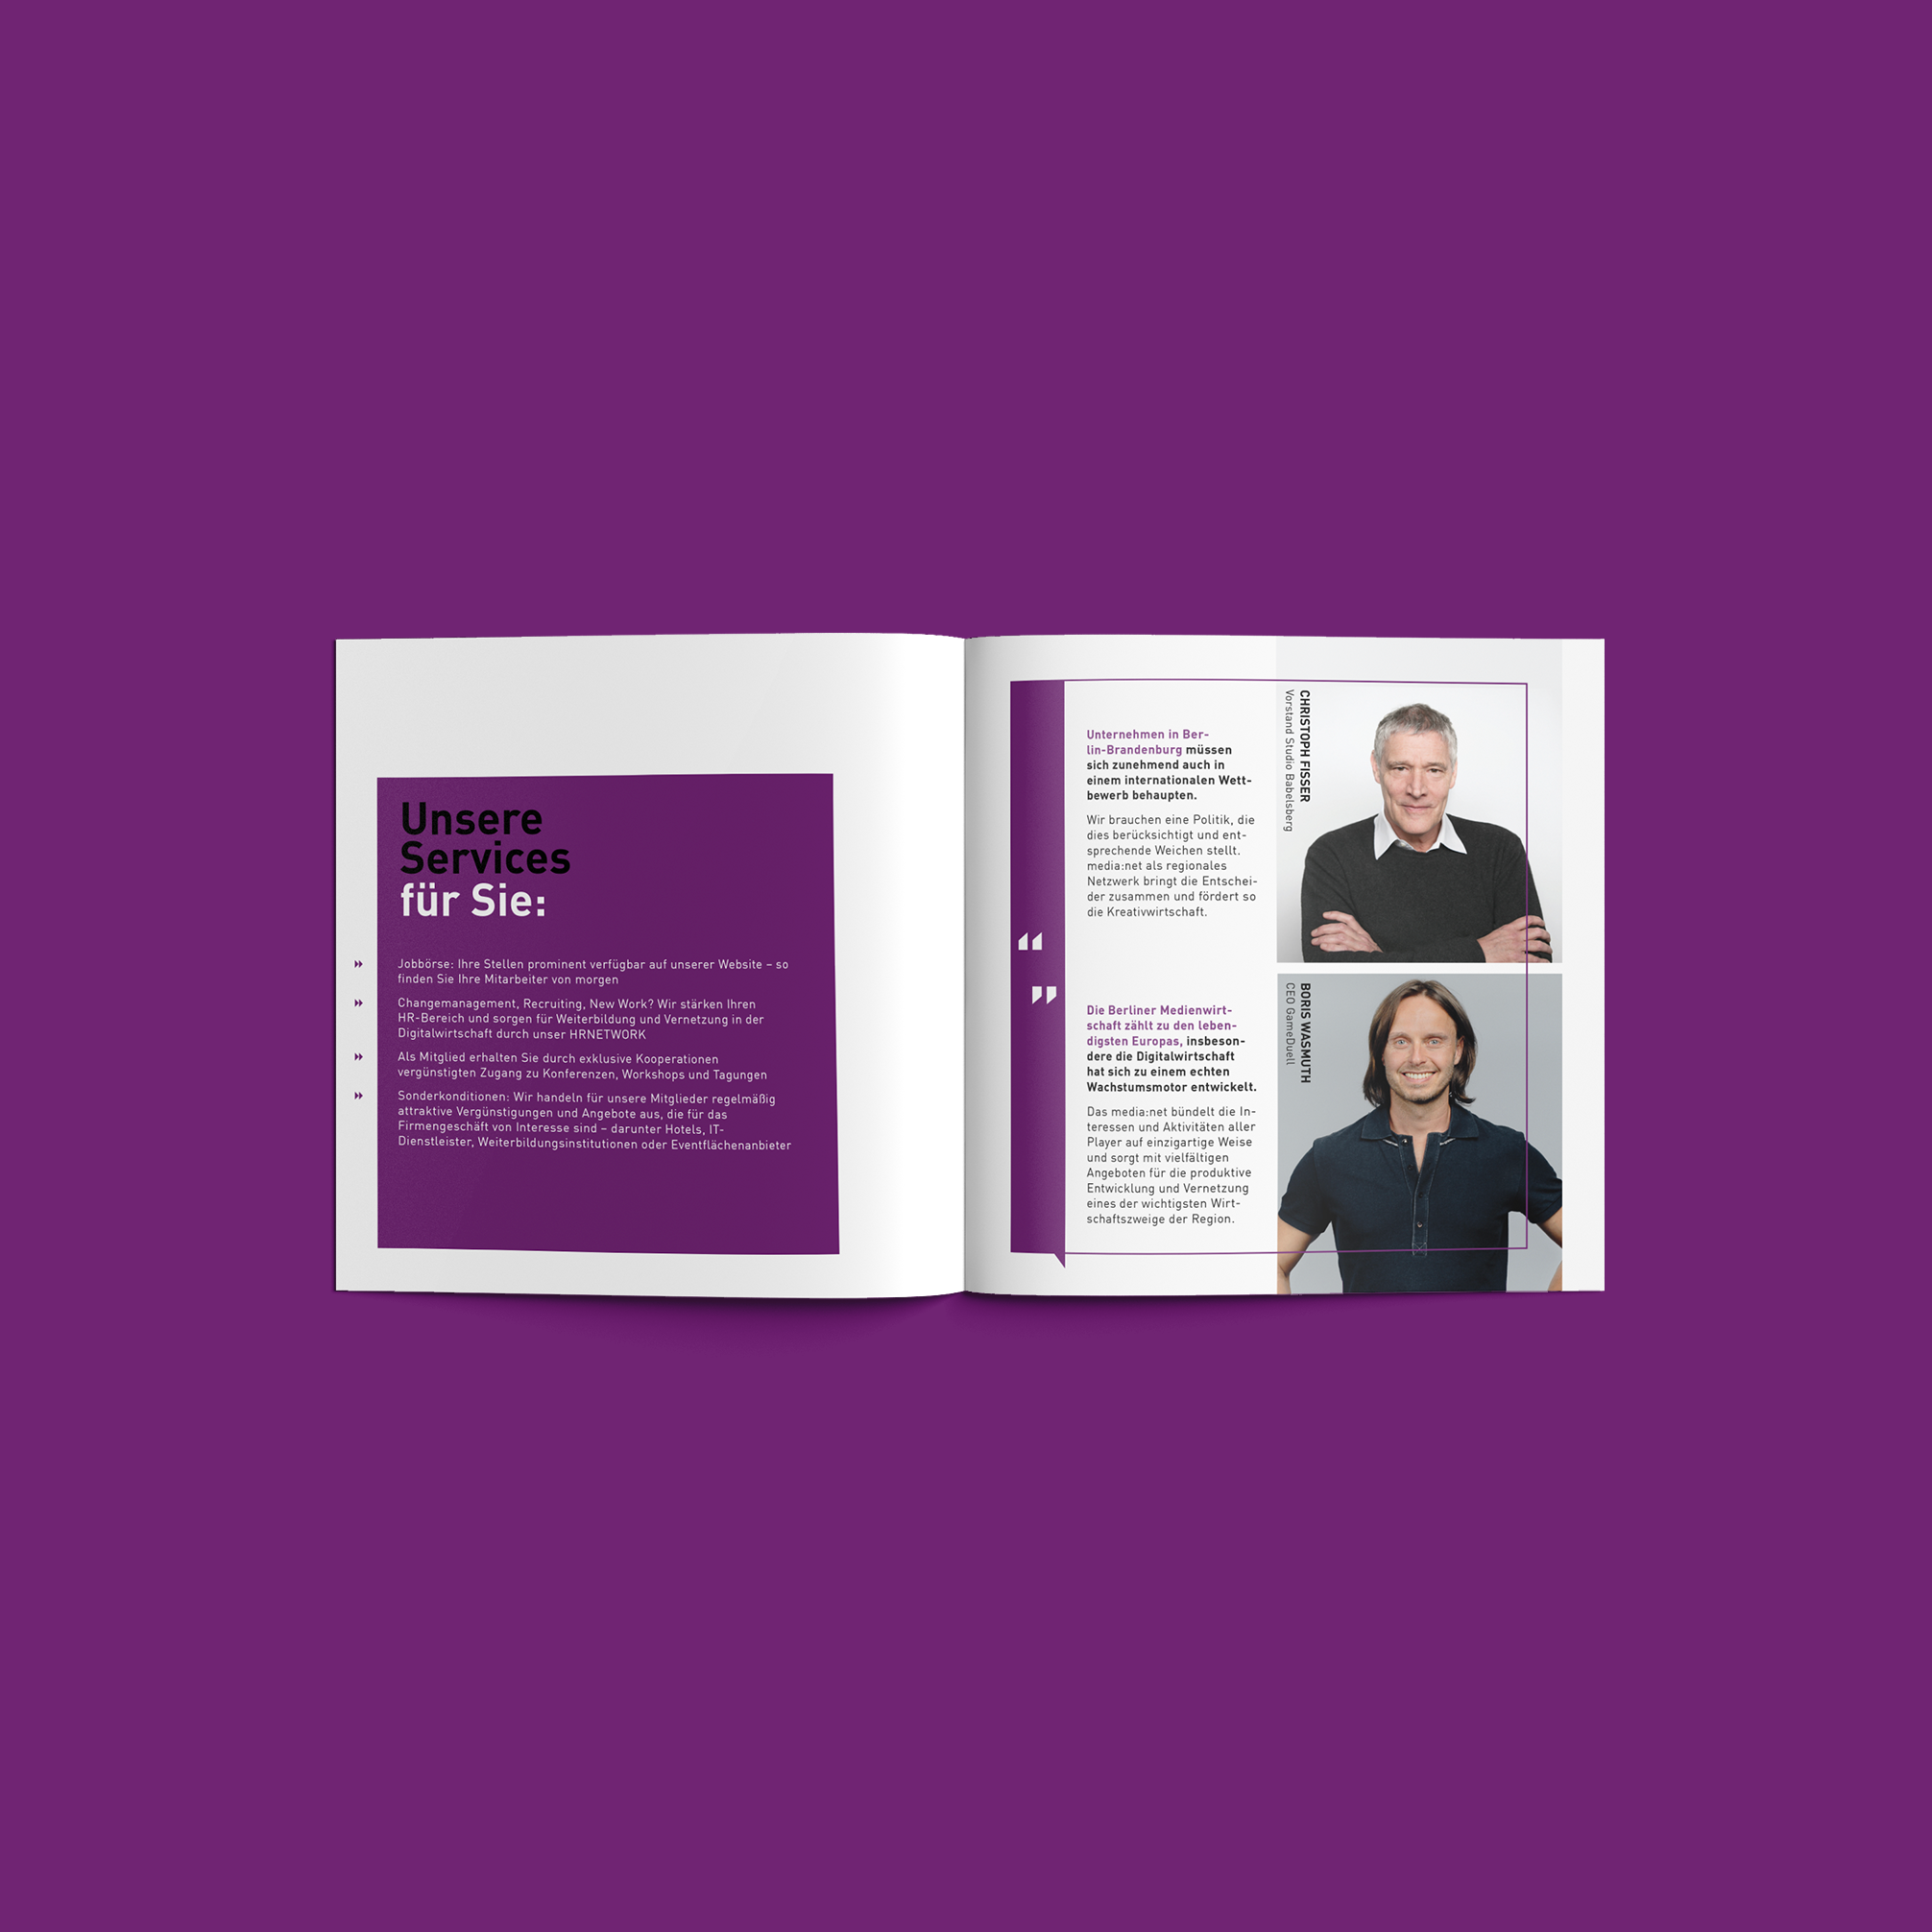 Media net berlinbrandenburg Business Broschüre | Redesign Corporate Design